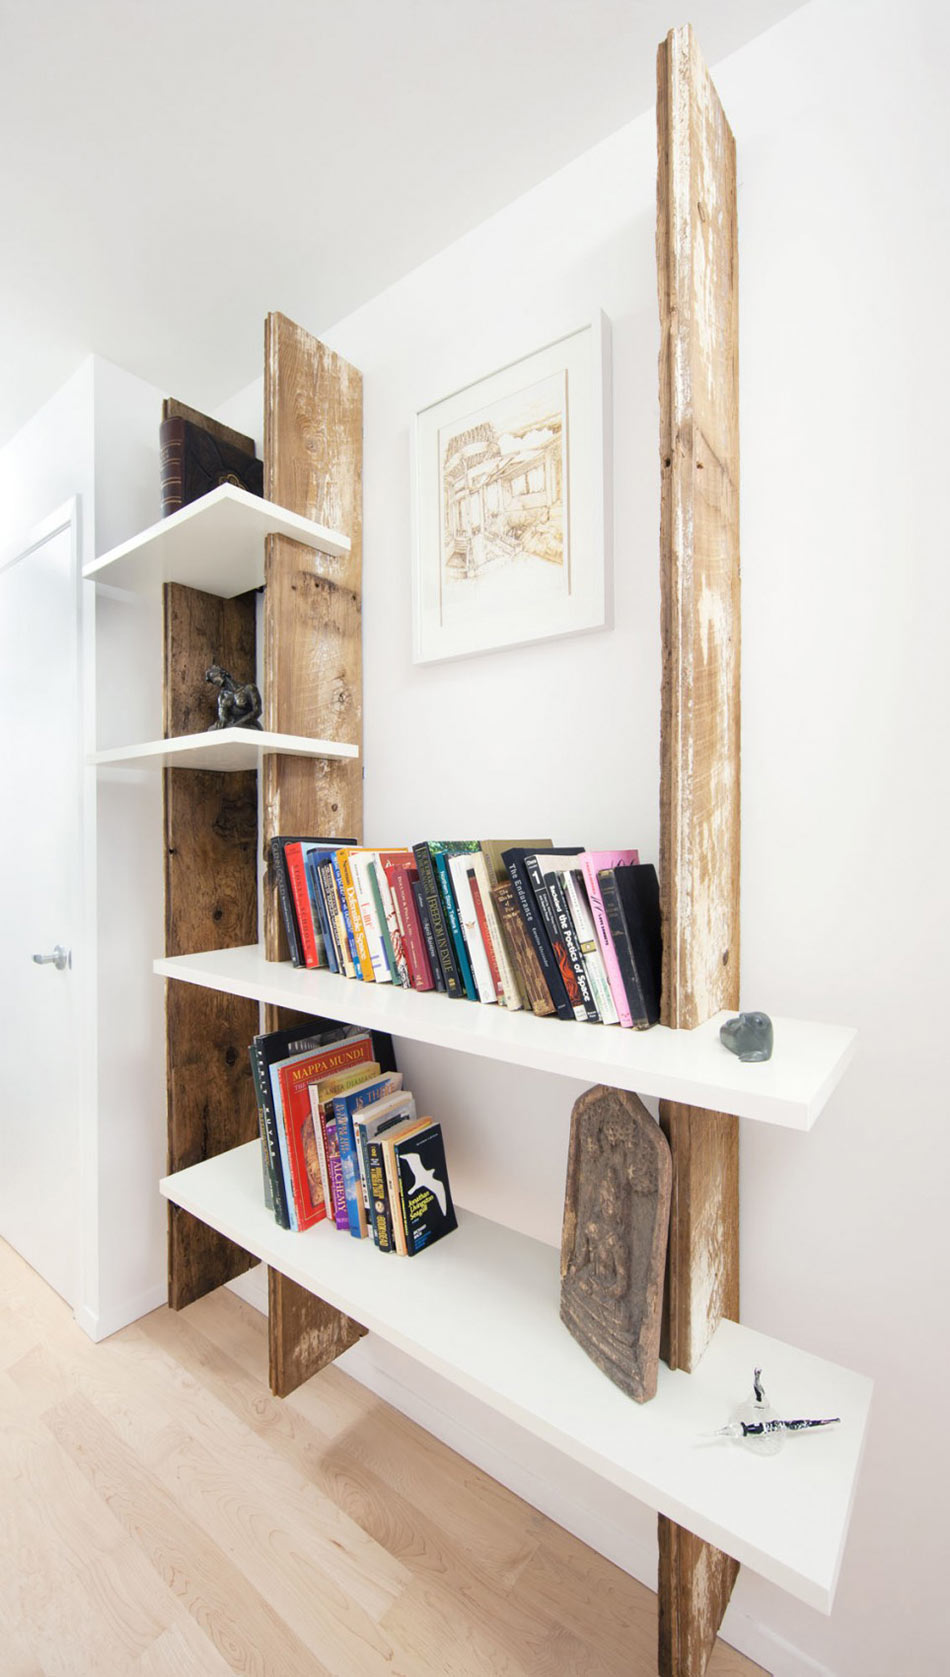 Bookshelf, Hintonburg Home in Ottawa, Canada